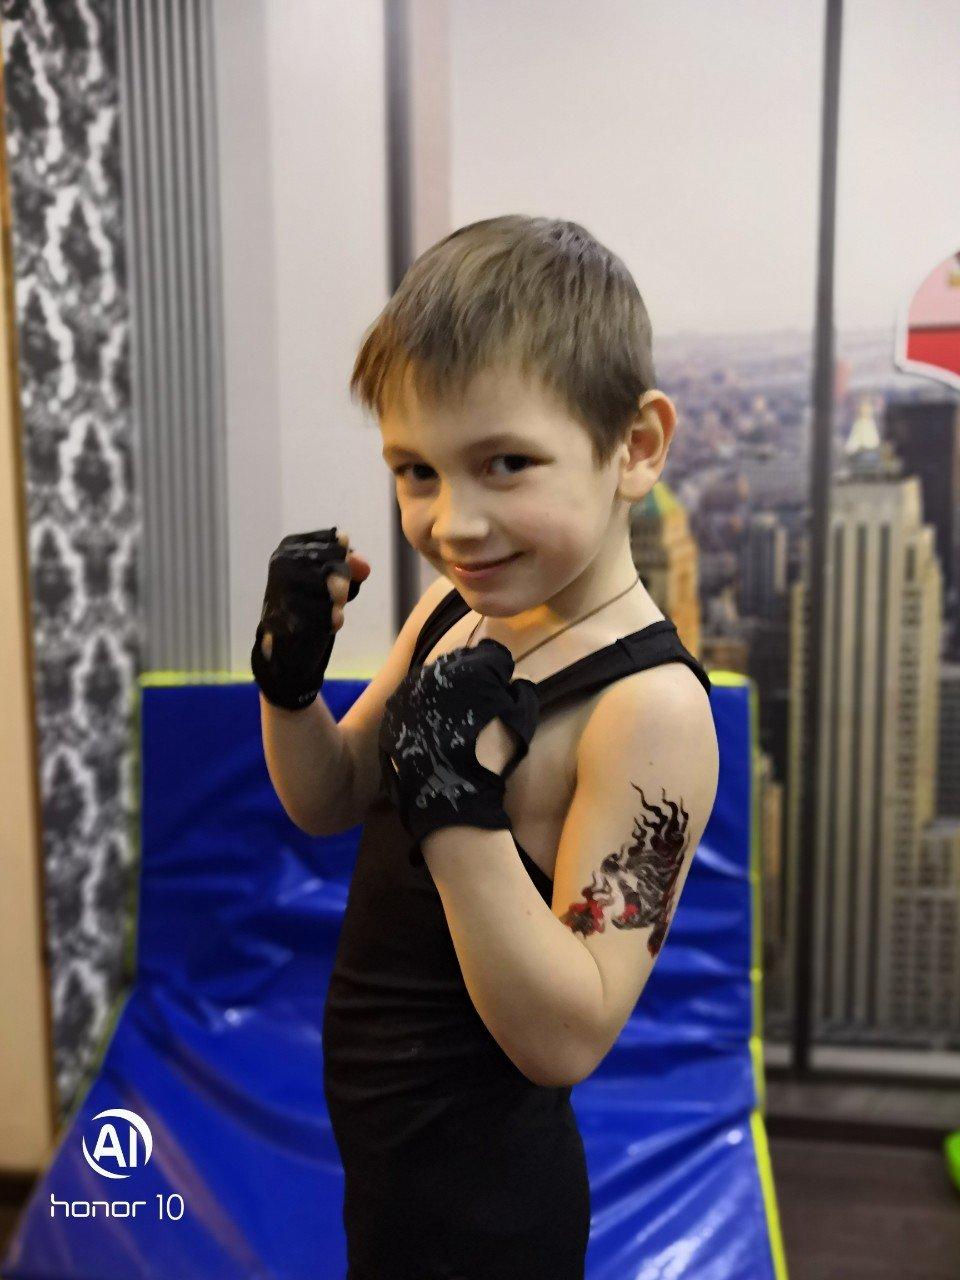 Ребёнок из Магнитогорска попал в Книгу Рекордов, фото-3